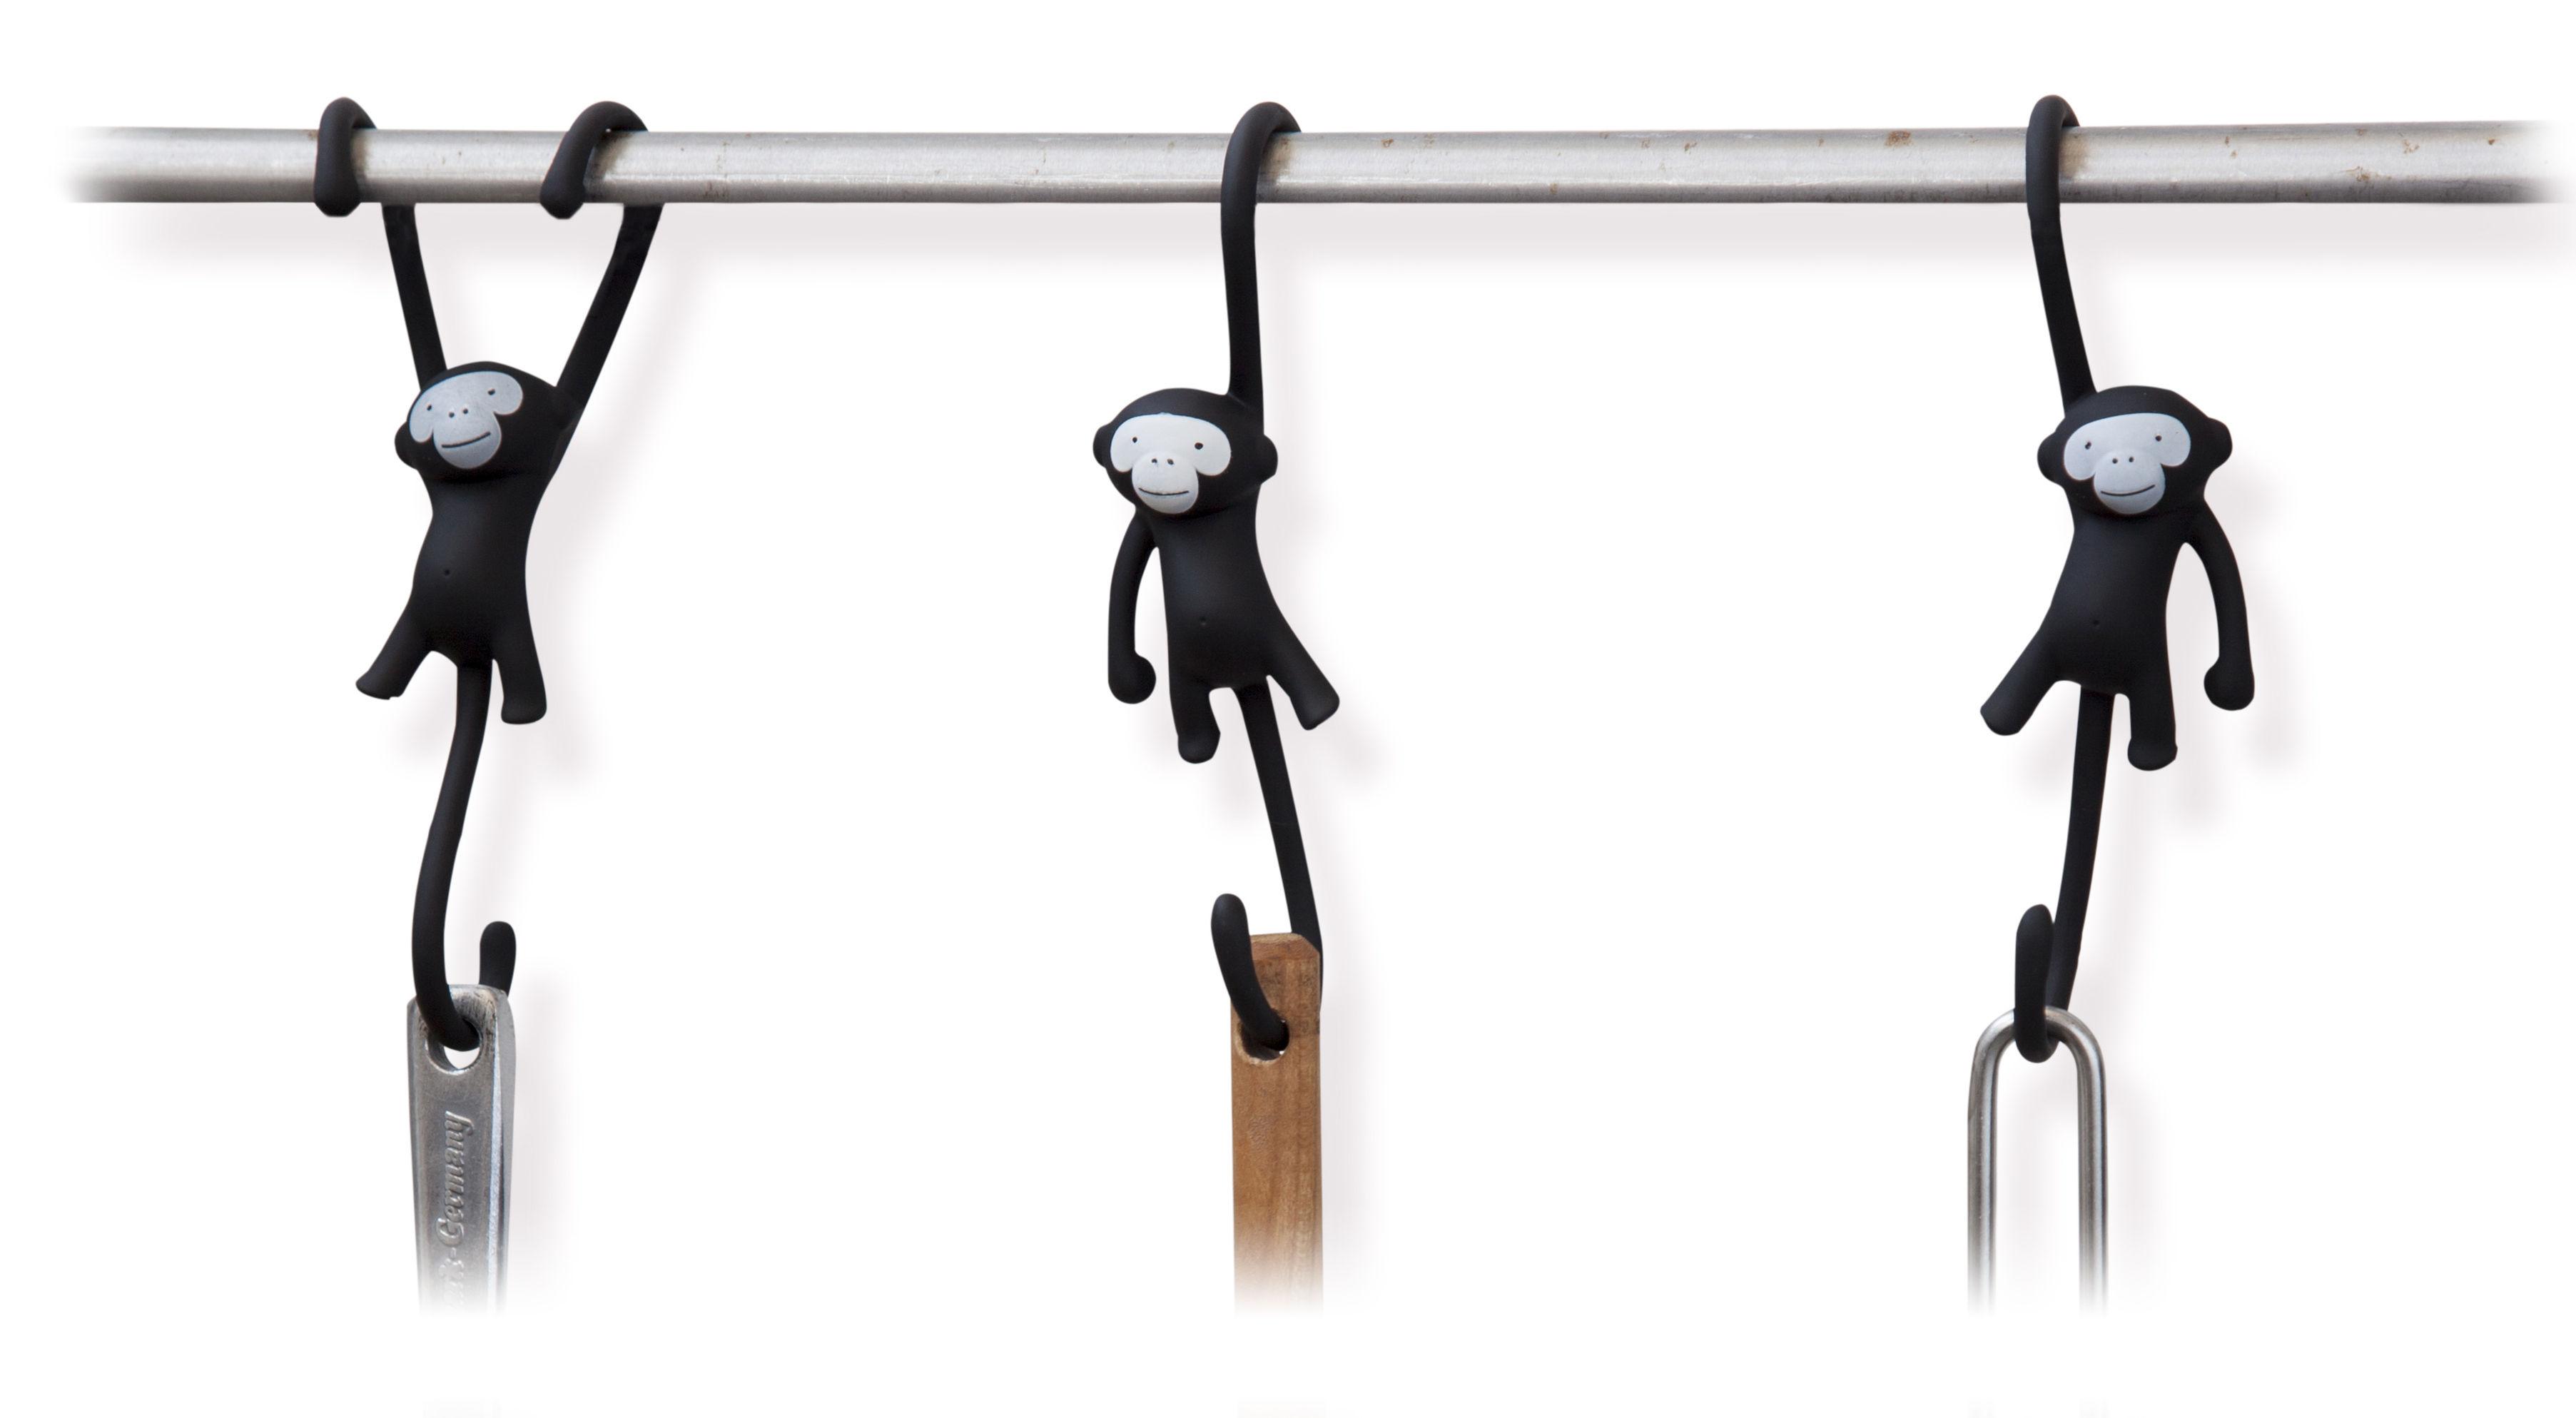 Accessoires - Accessoires für das Bad - Just hanging Haken / 3er-Set - Pa Design - Schwarz - Plastikmaterial